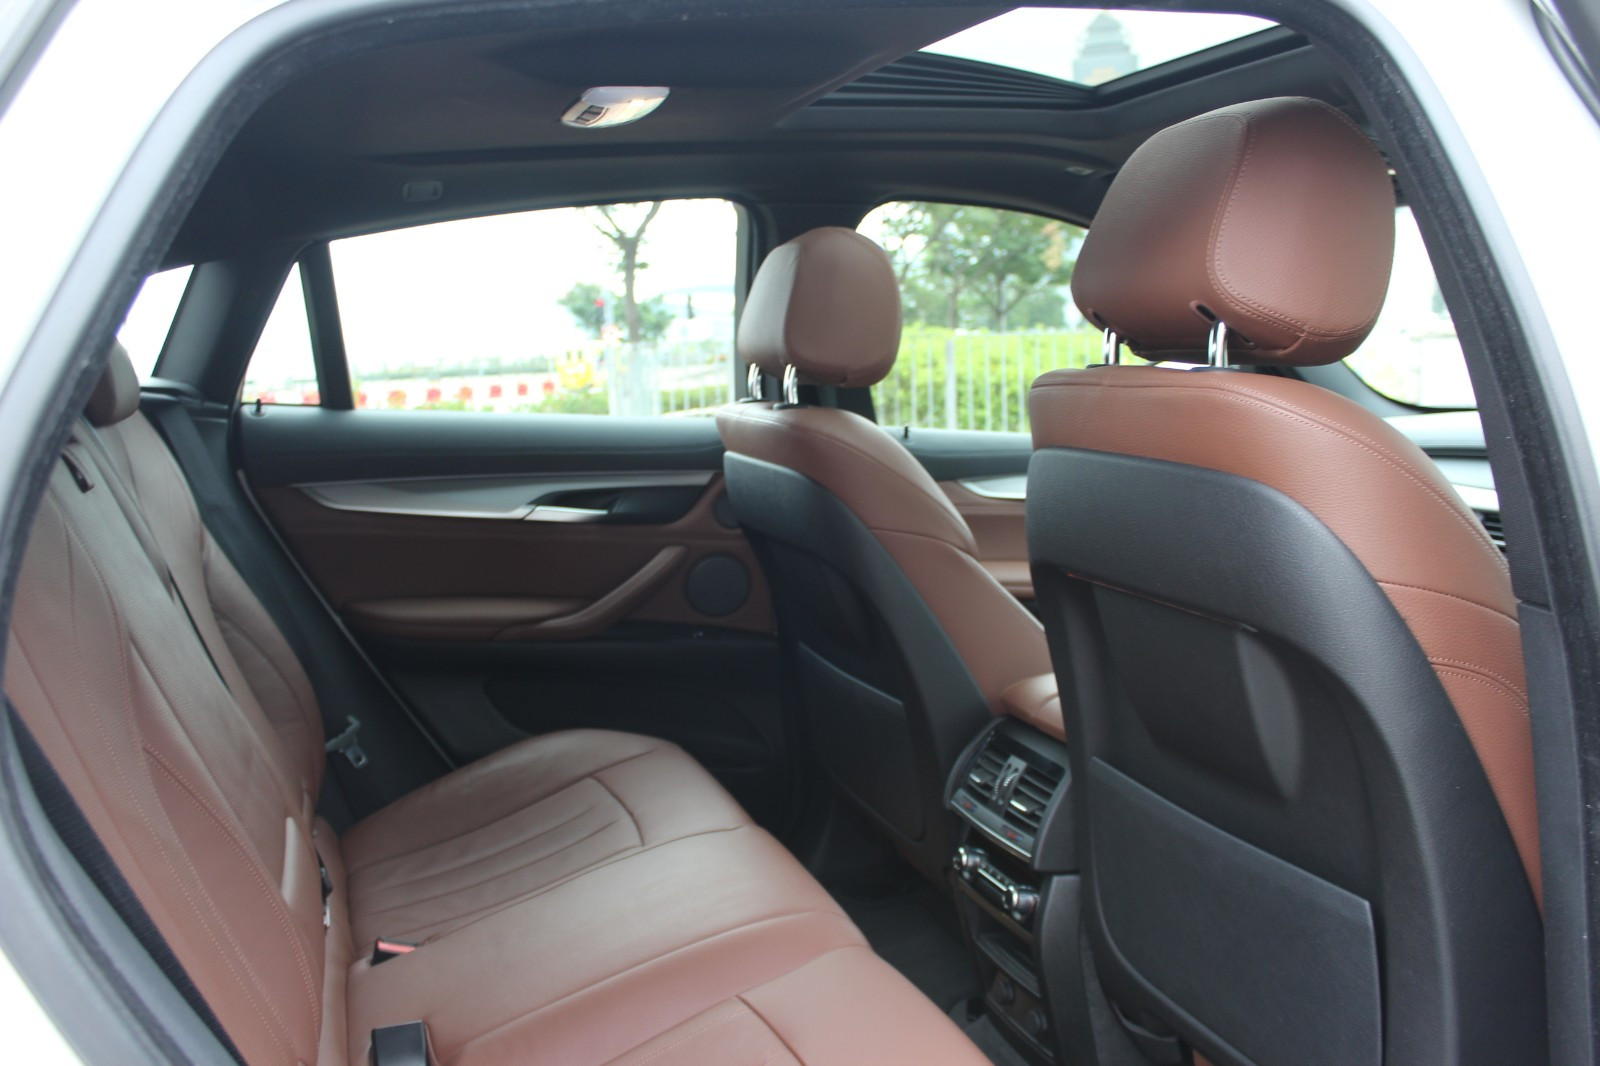 X6 xDrive 30d M Sport Edition - Image 4